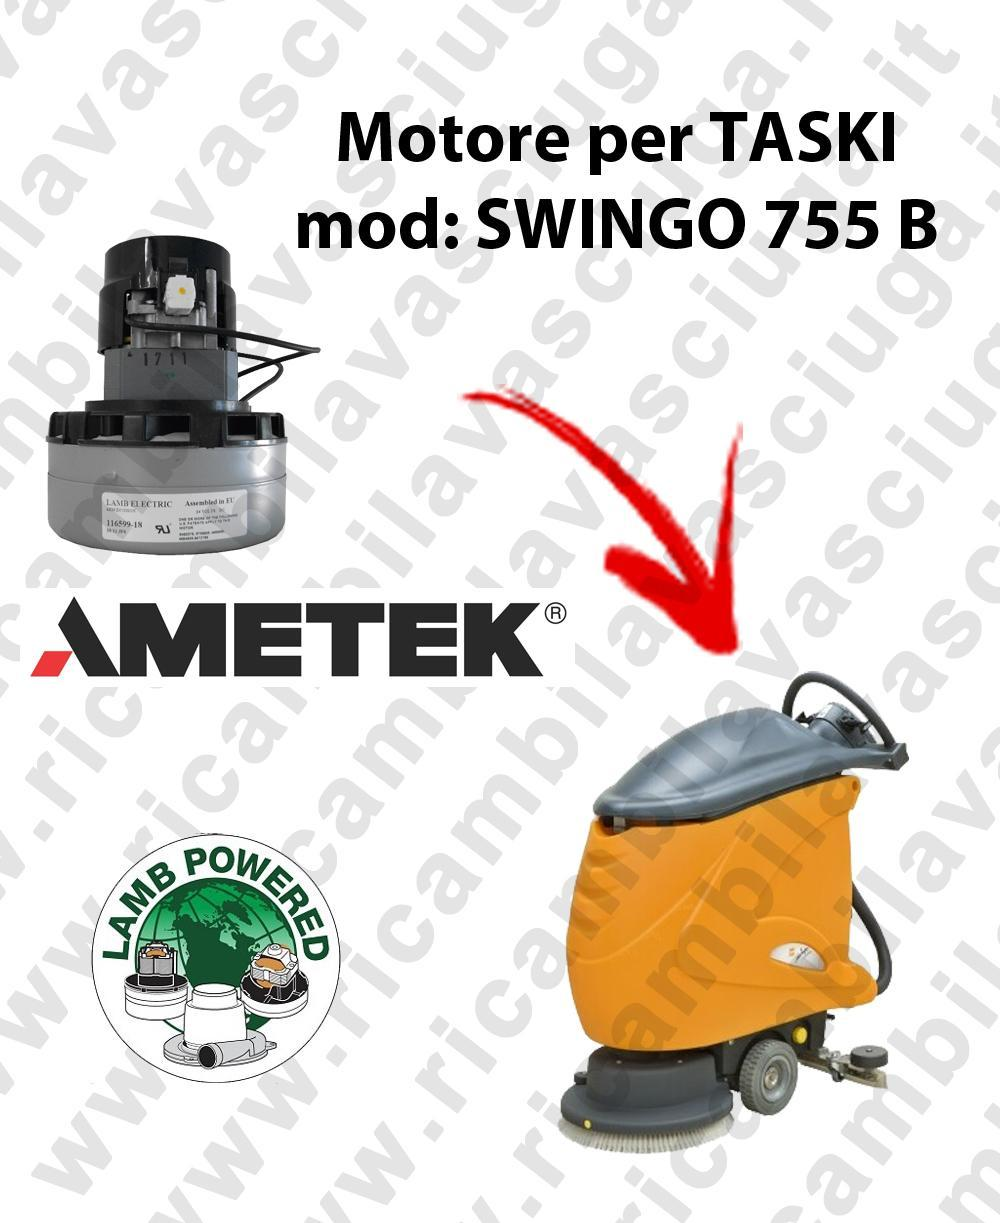 SWINGO 755 B MOTEUR ASPIRATION LAMB AMATEK pour autolaveuses TASKI